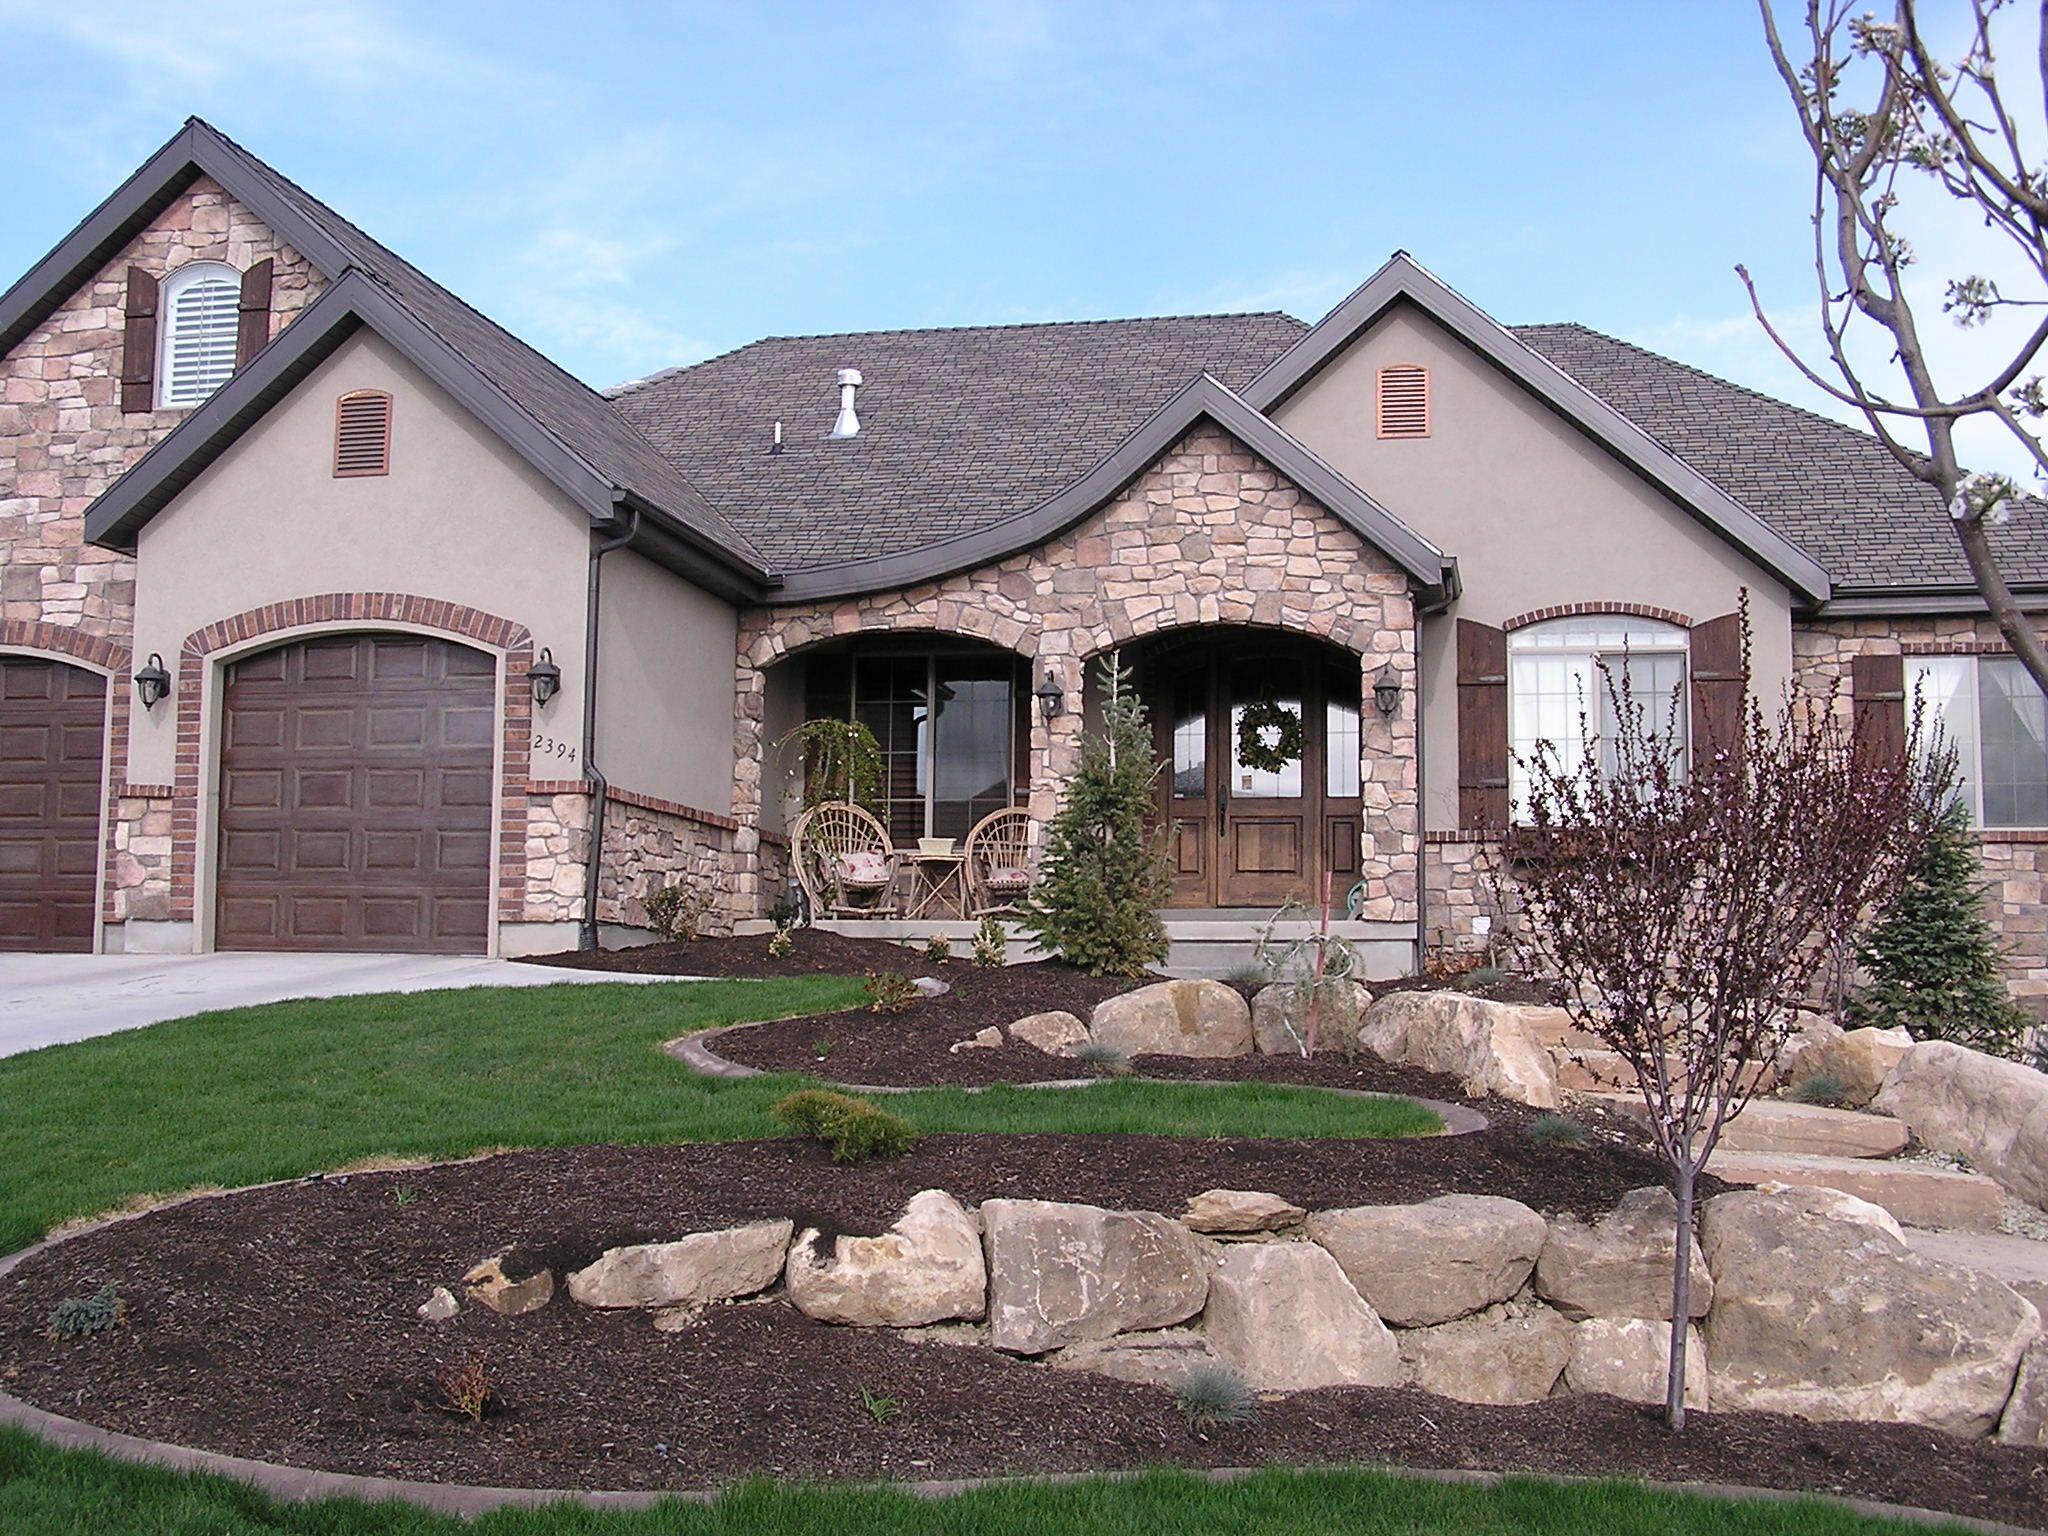 Brick Stone And Stucco And Shutters Stucco Homes Stucco And